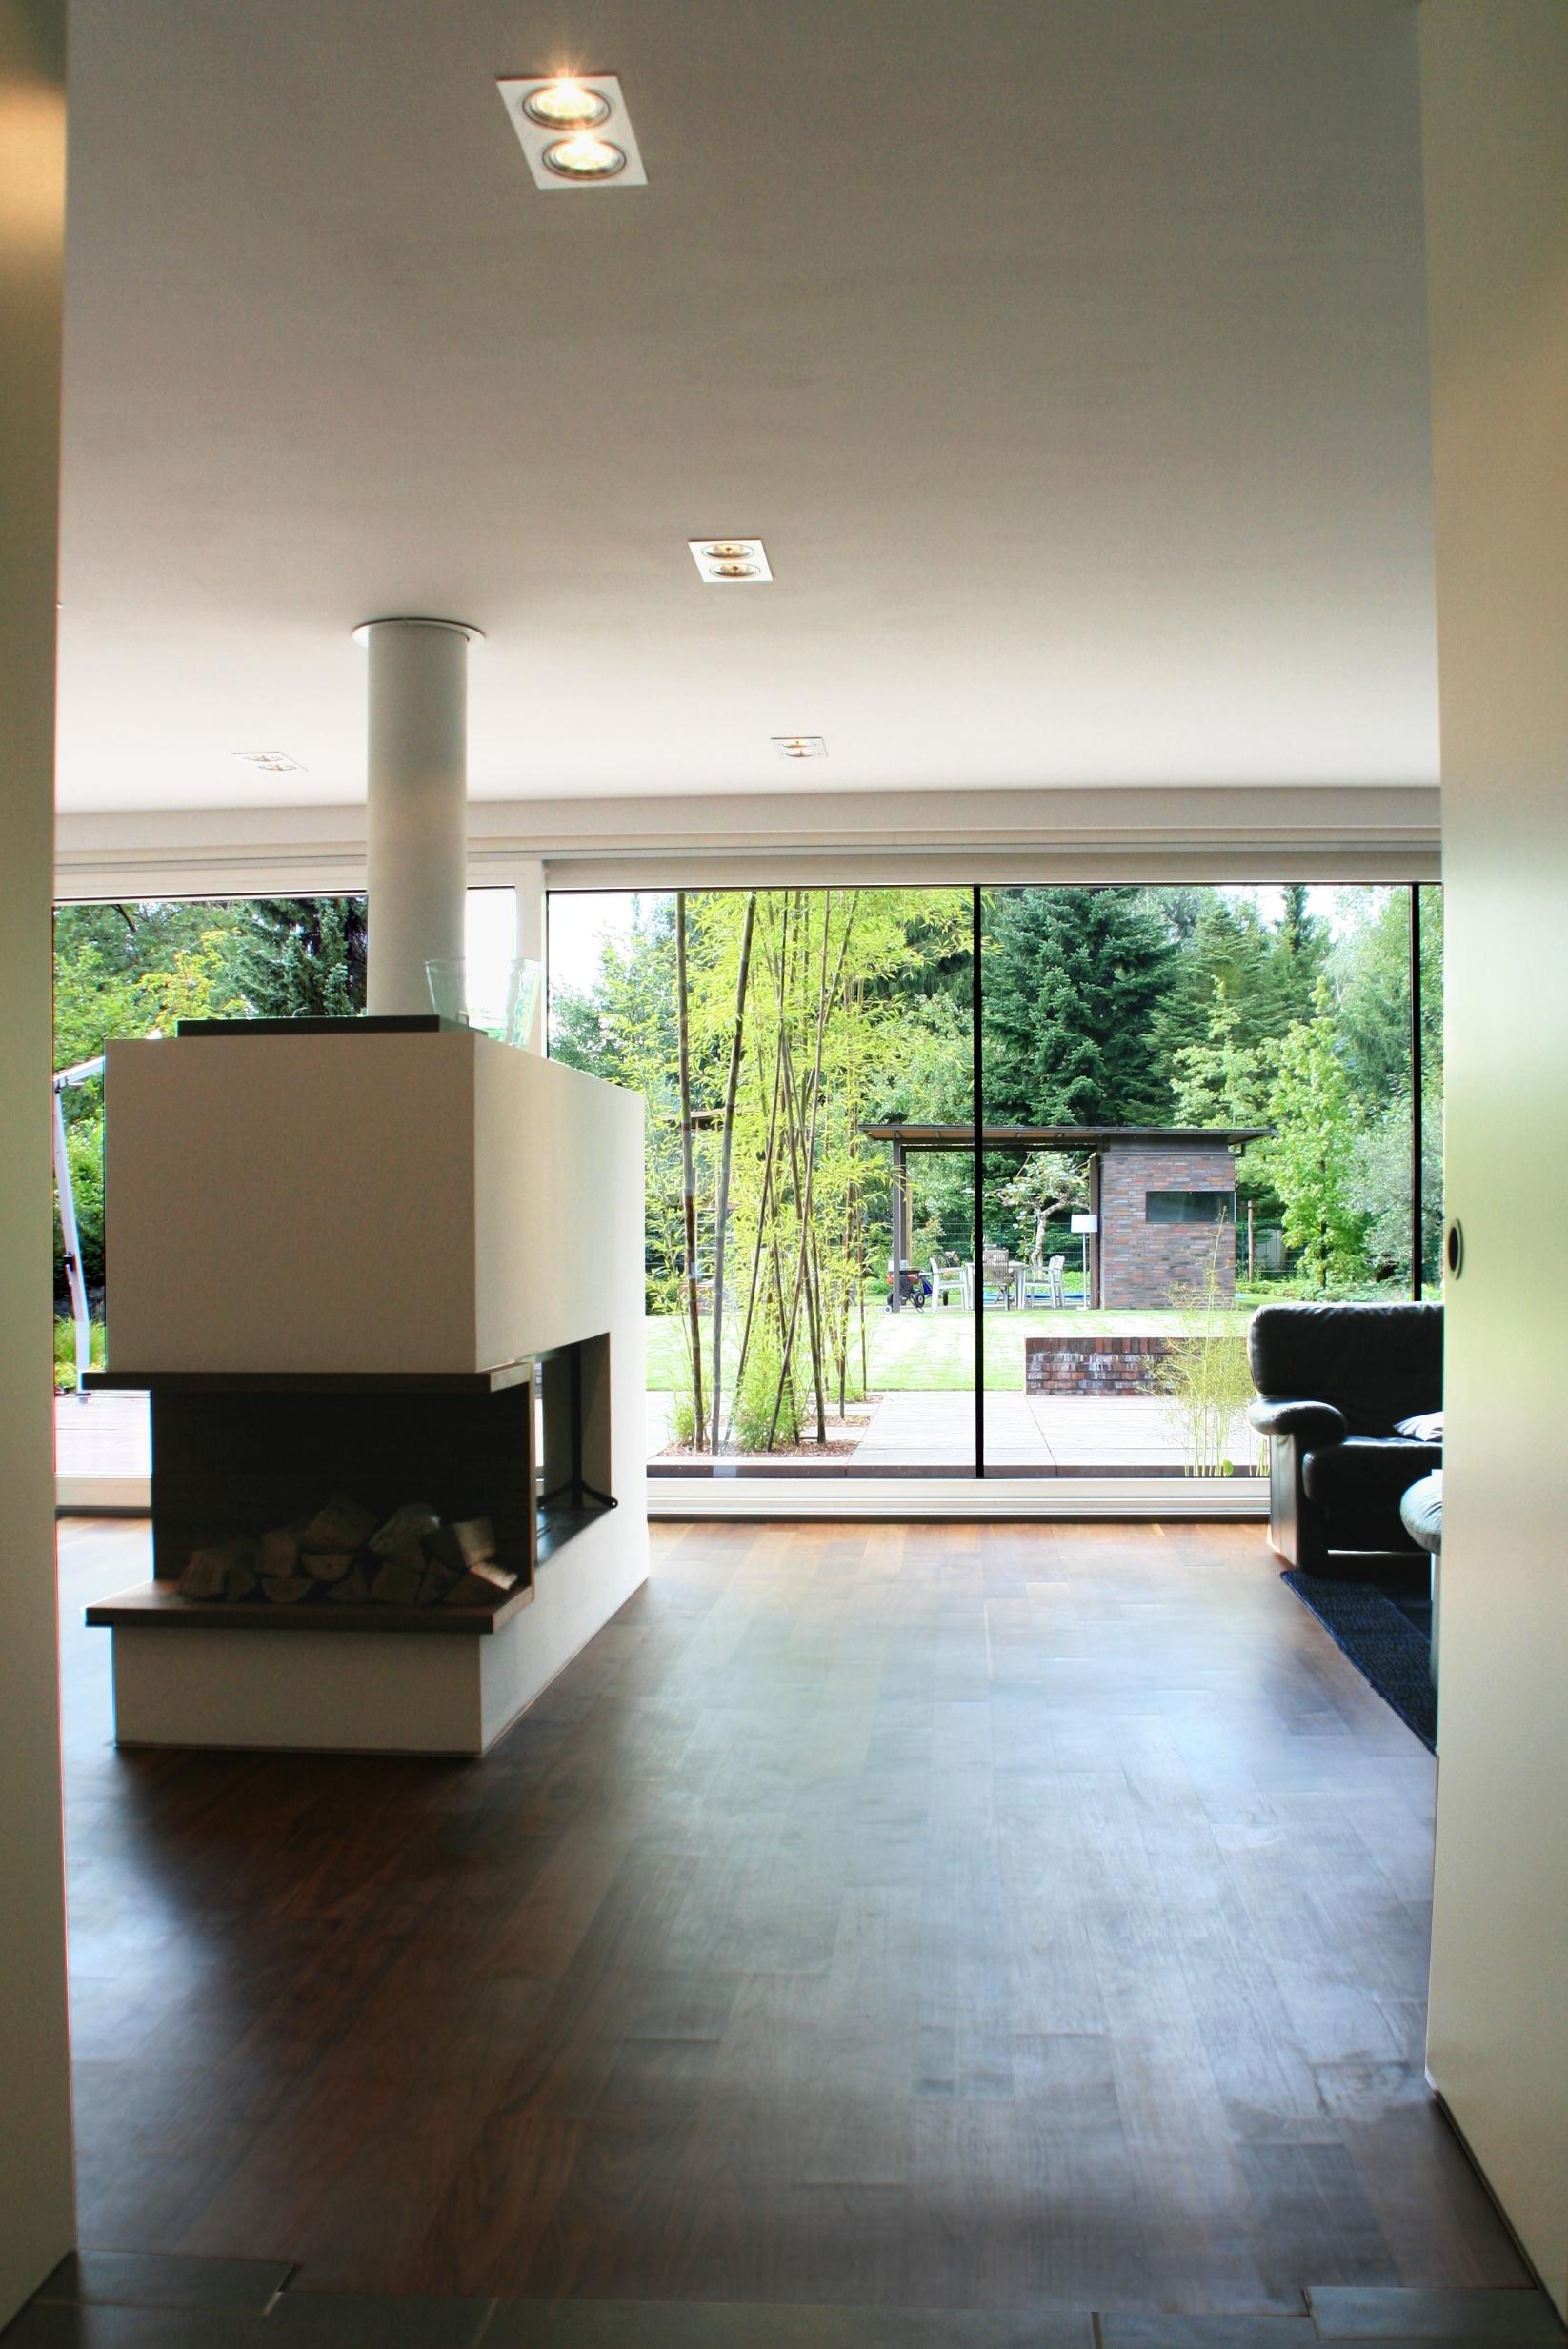 wohngeb ude lorenzen geb udetechnik heizung klimatechnik sanit r l ftungen. Black Bedroom Furniture Sets. Home Design Ideas